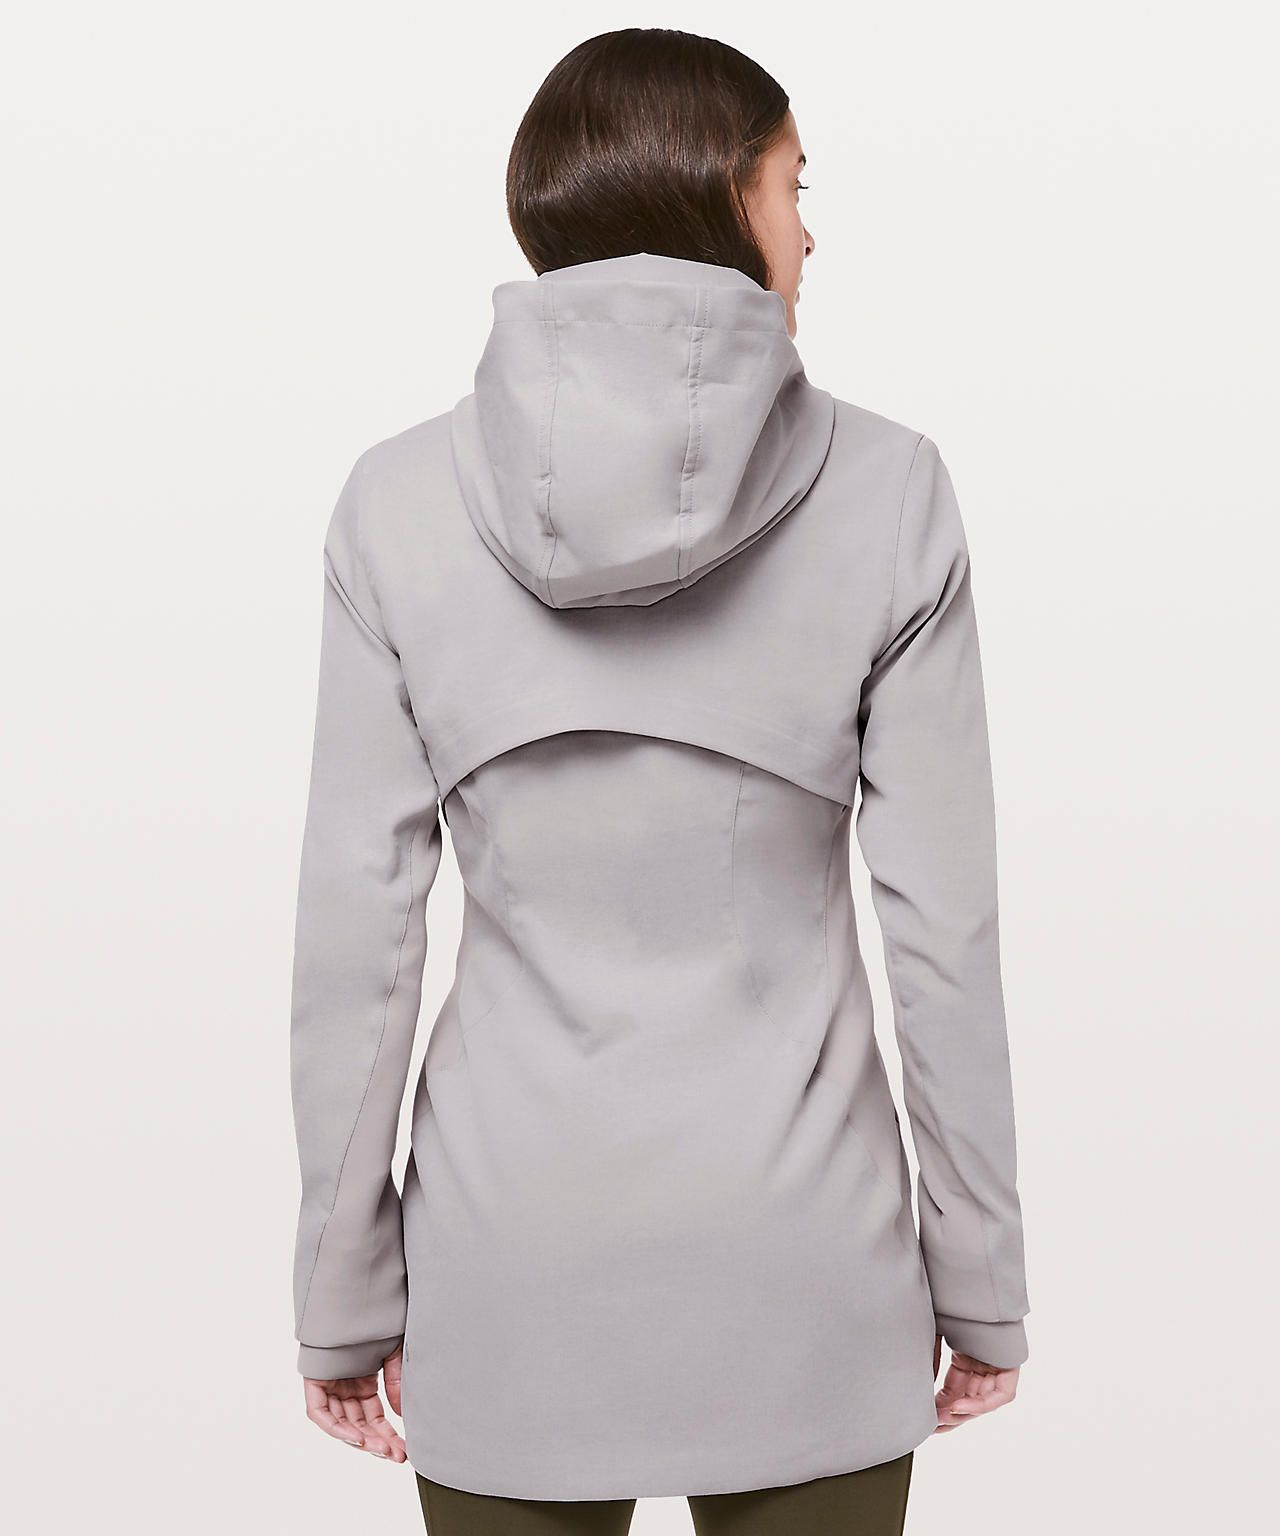 Like A Glove Jacket Women S Jackets Outerwear Lululemon Athletica Jackets For Women Technical Clothing Jackets [ 1536 x 1280 Pixel ]